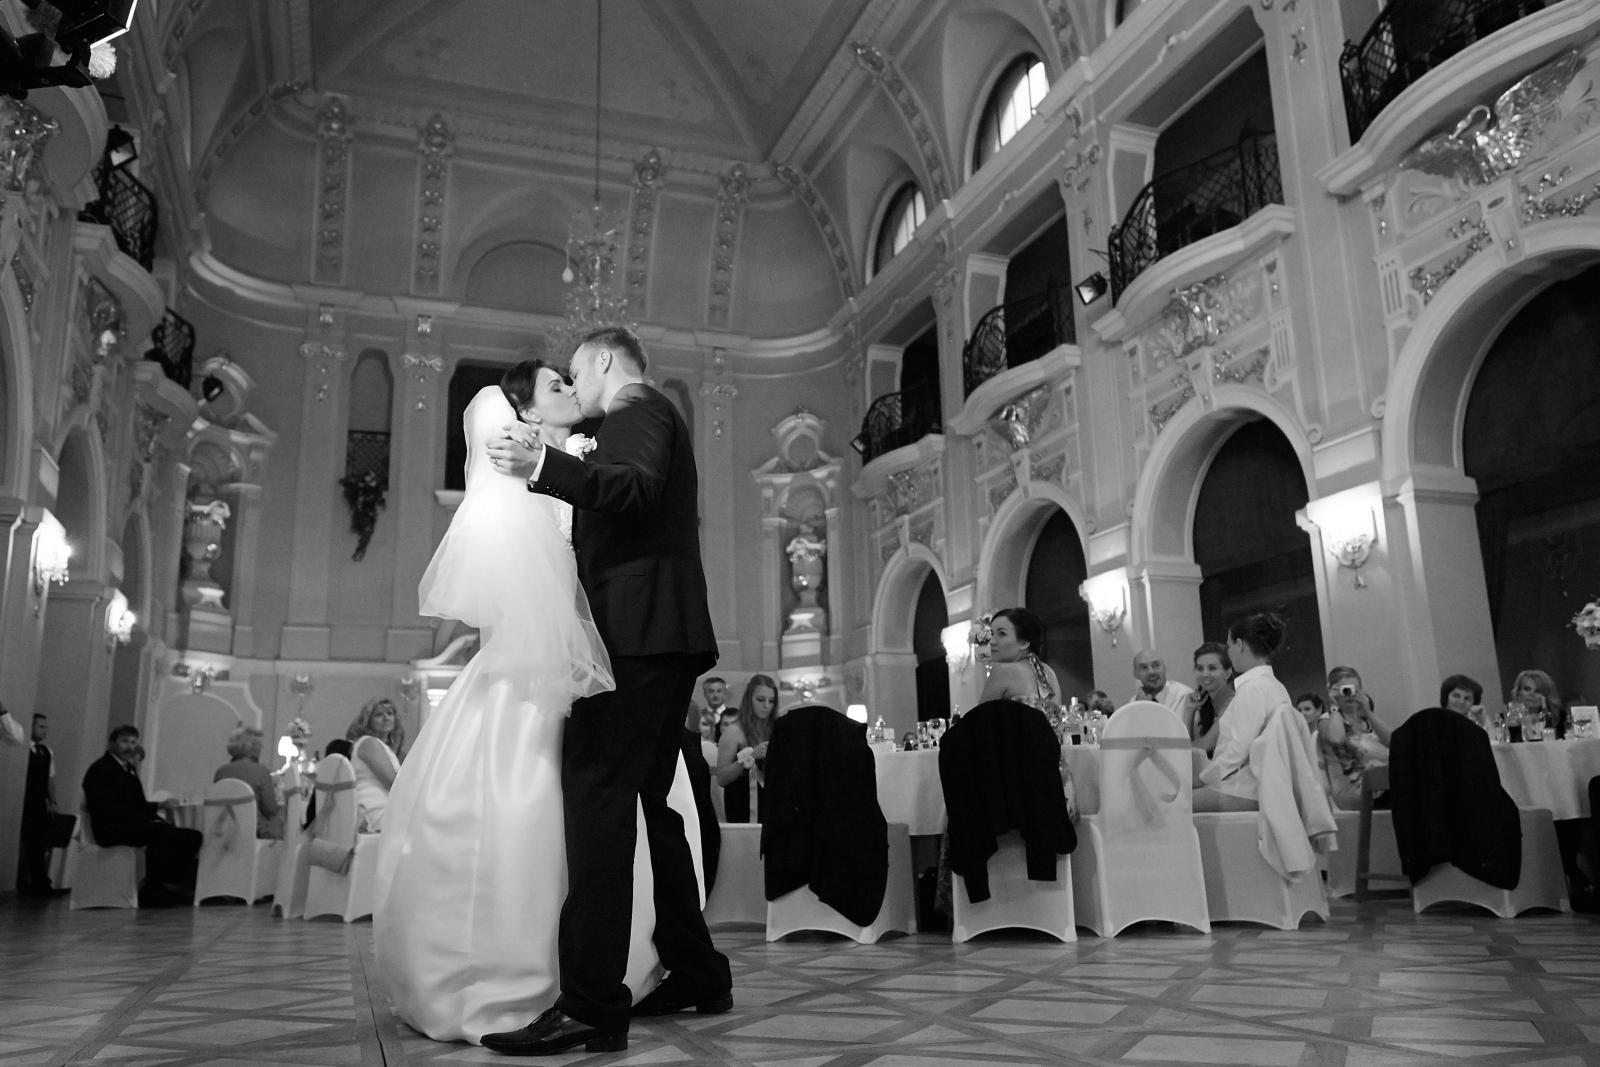 Svadba M+M - Obrázok č. 21